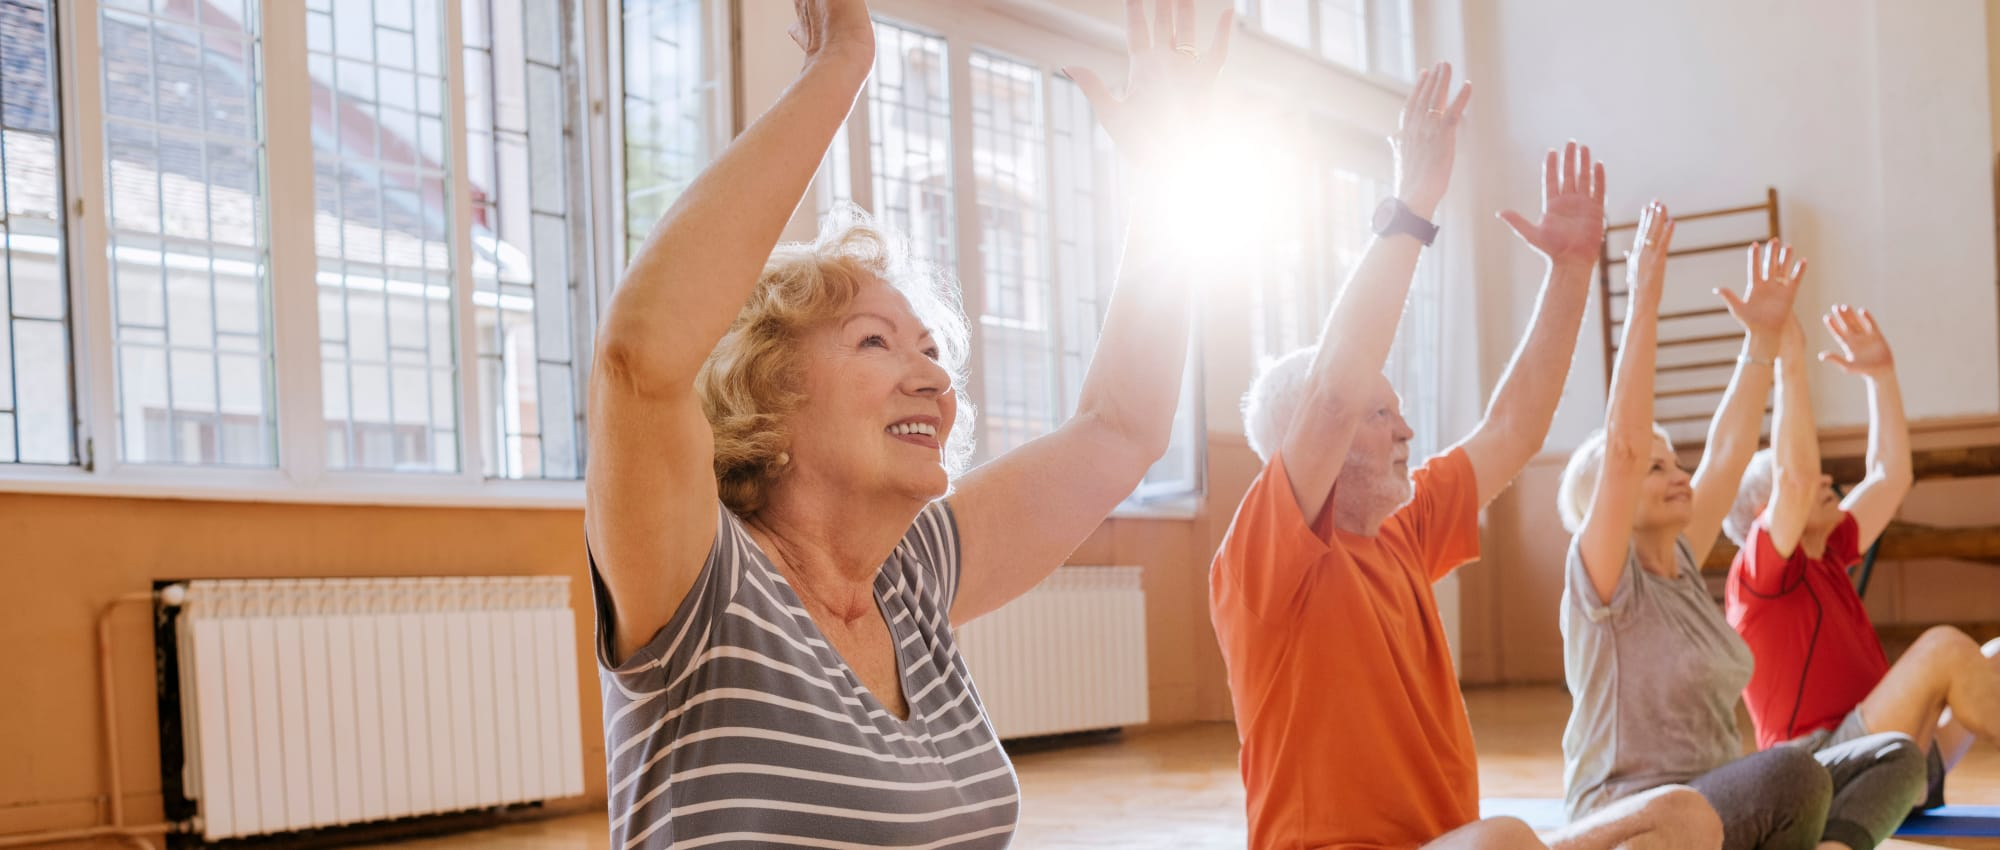 Our programs at Milestone Senior Living in Tomahawk, Wisconsin.